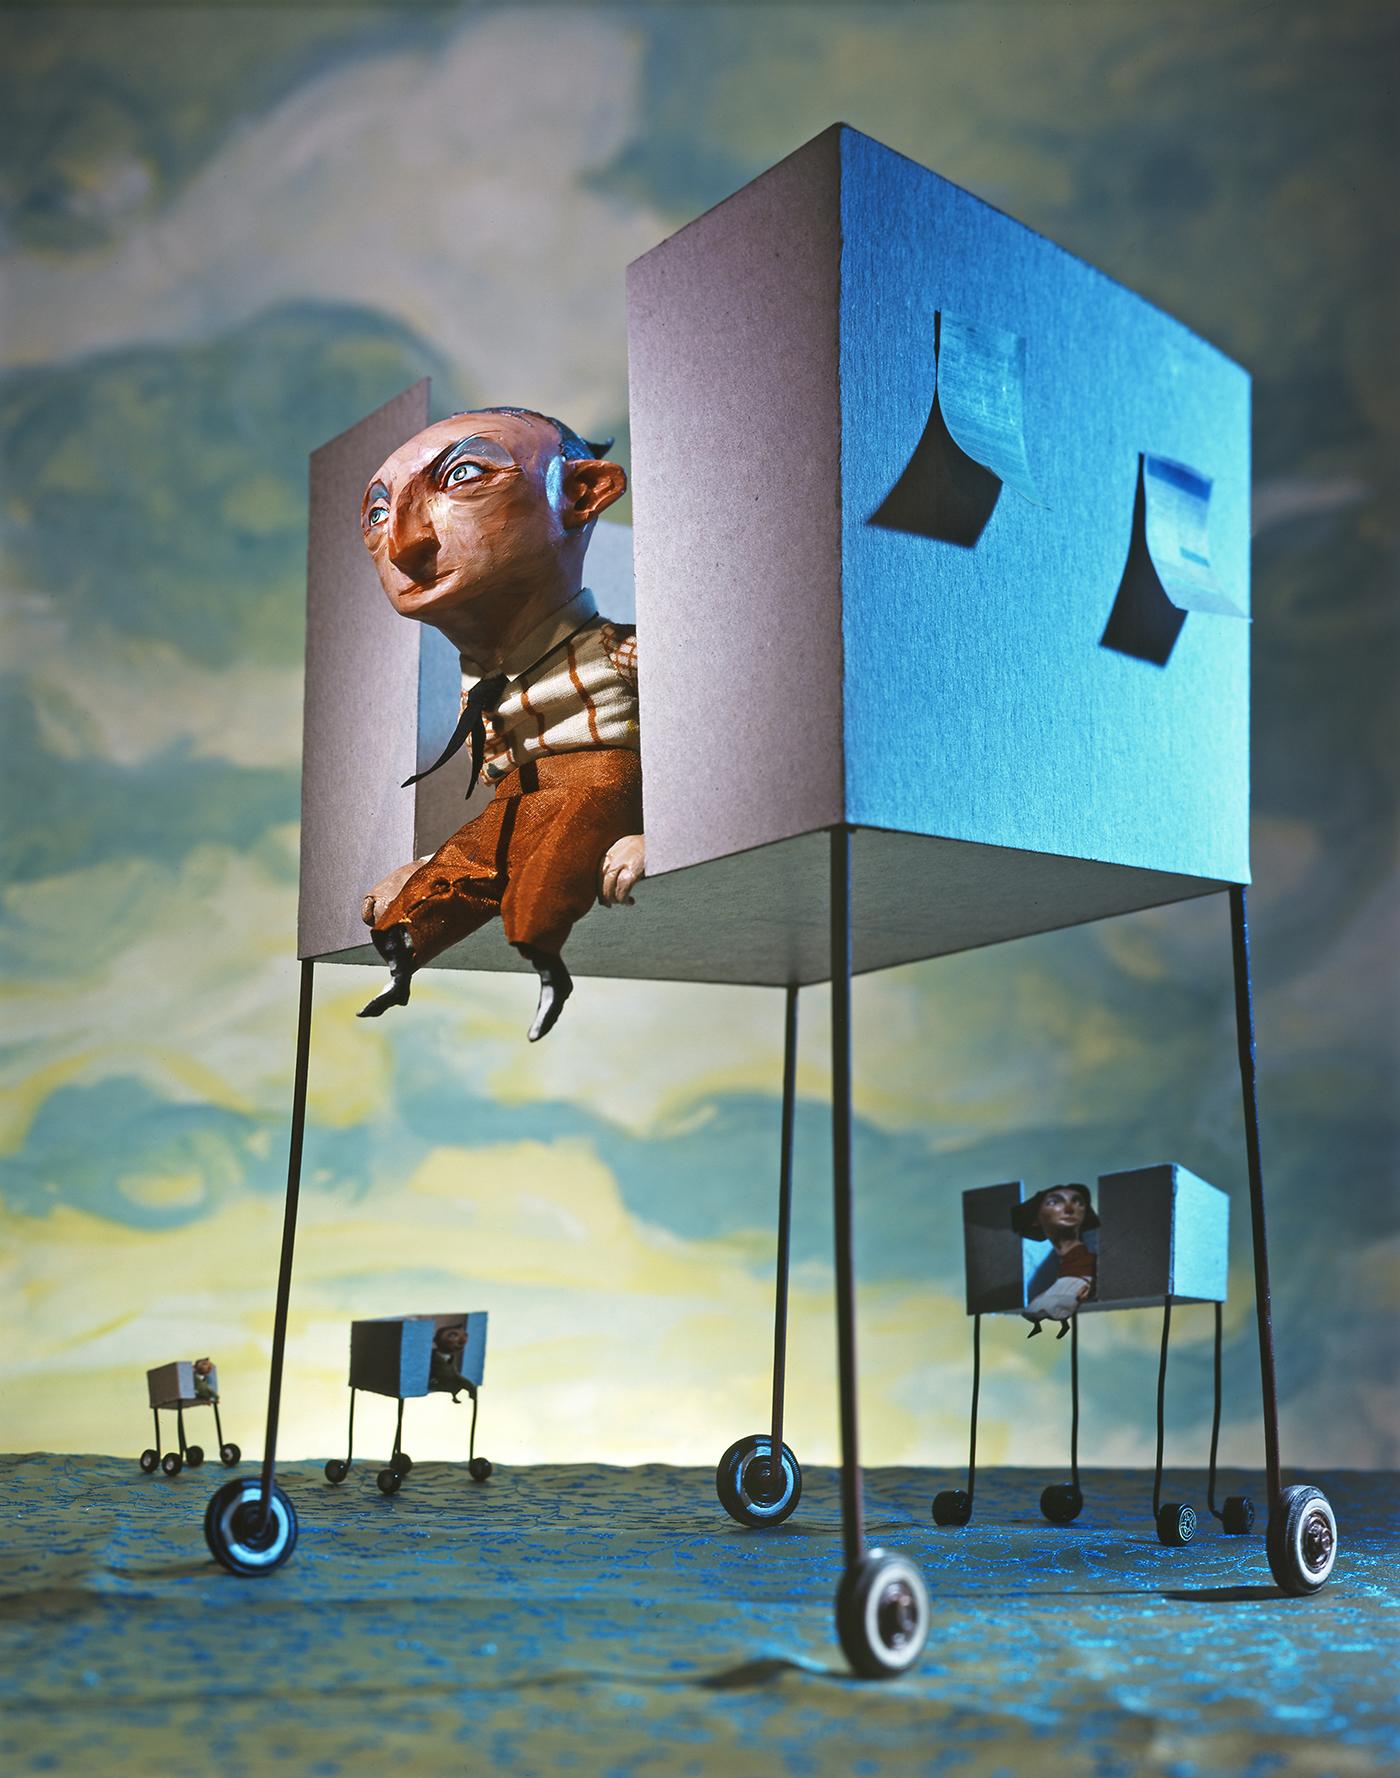 3x3 2008 - ARTIST: Red Nose StudioTITLE: Rolling CubiclesCLIENT: Plansponsor